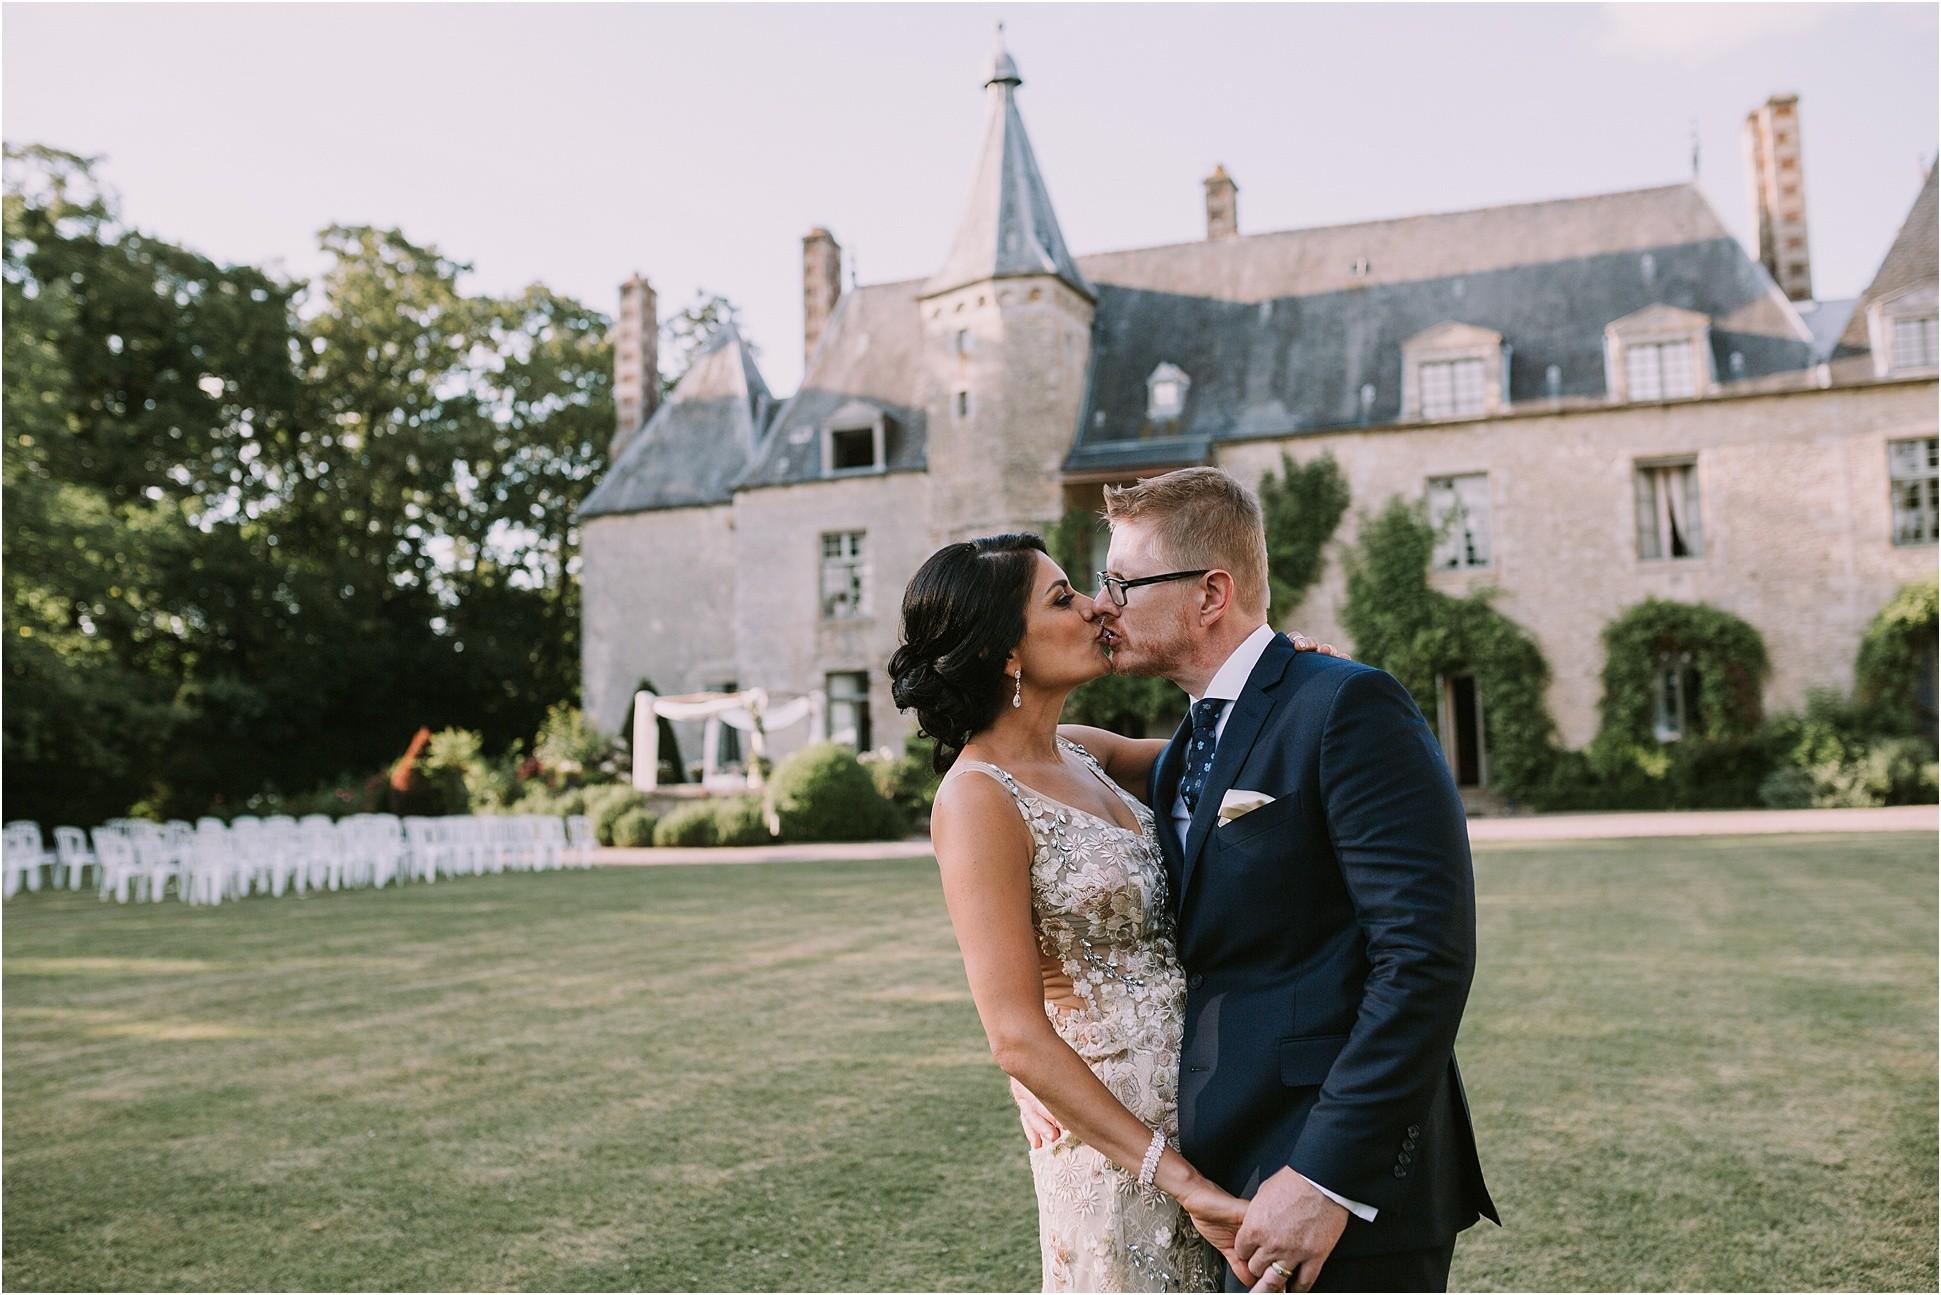 Kateryna-photos-photographe-mariage-chateau-st-paterne-mayenne-normandie_0181.jpg